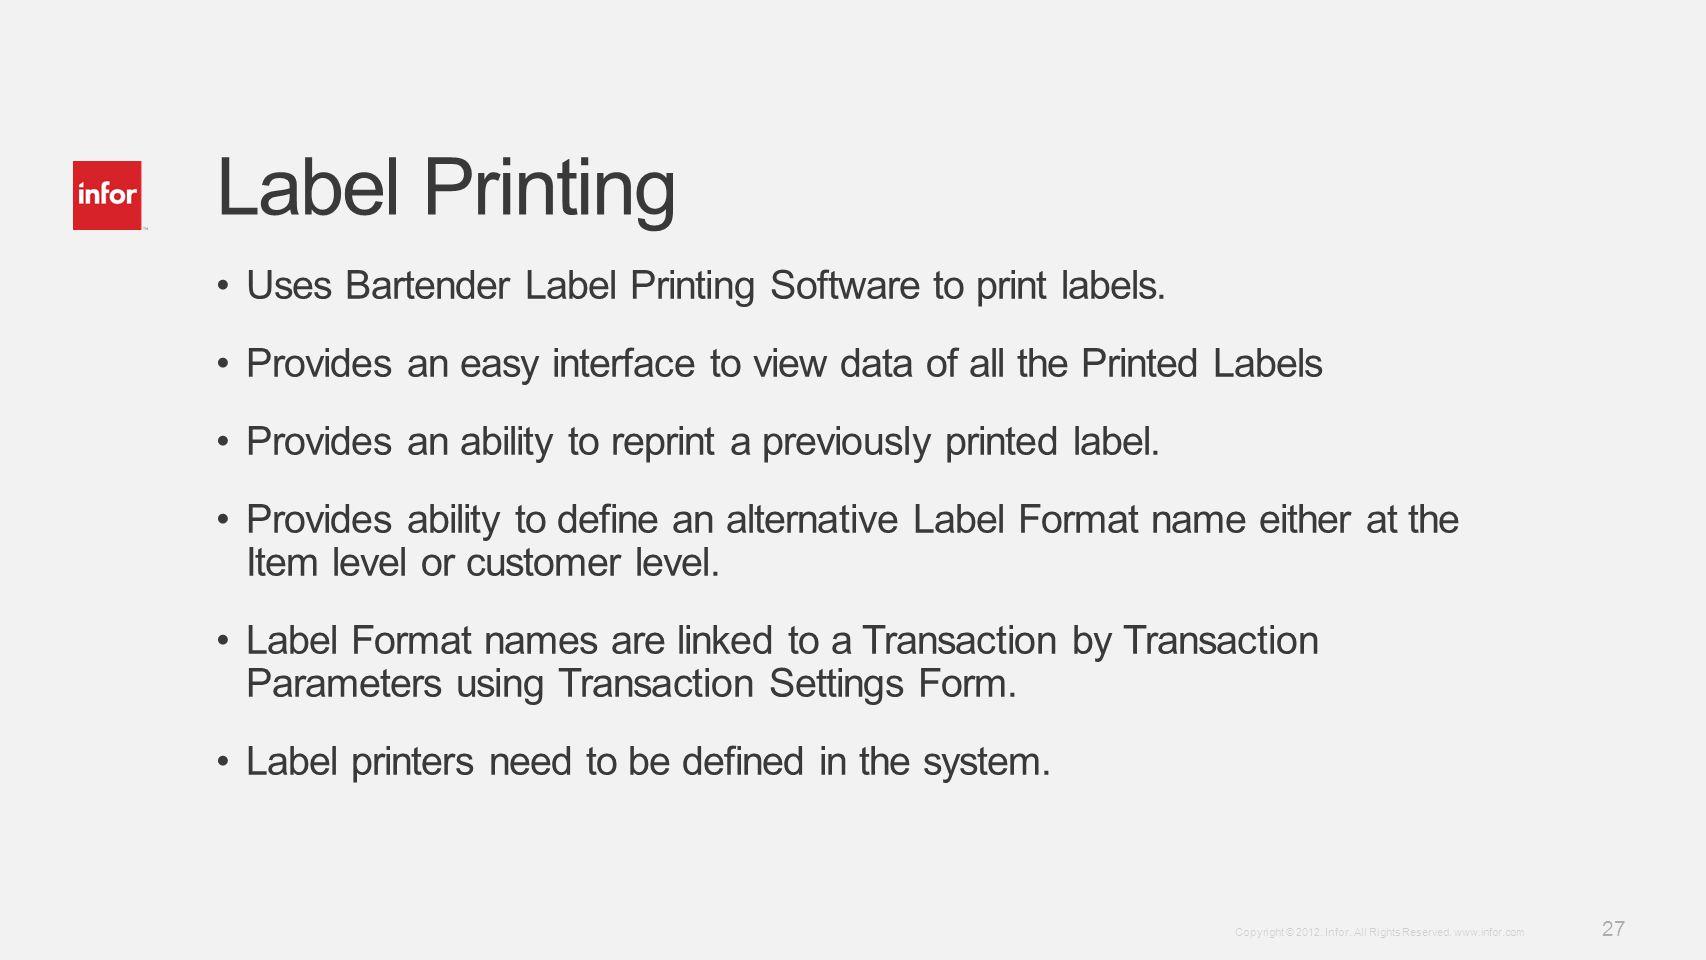 Template v4 September 27, 2012 27 Copyright © 2012. Infor. All Rights Reserved. www.infor.com Label Printing Uses Bartender Label Printing Software to